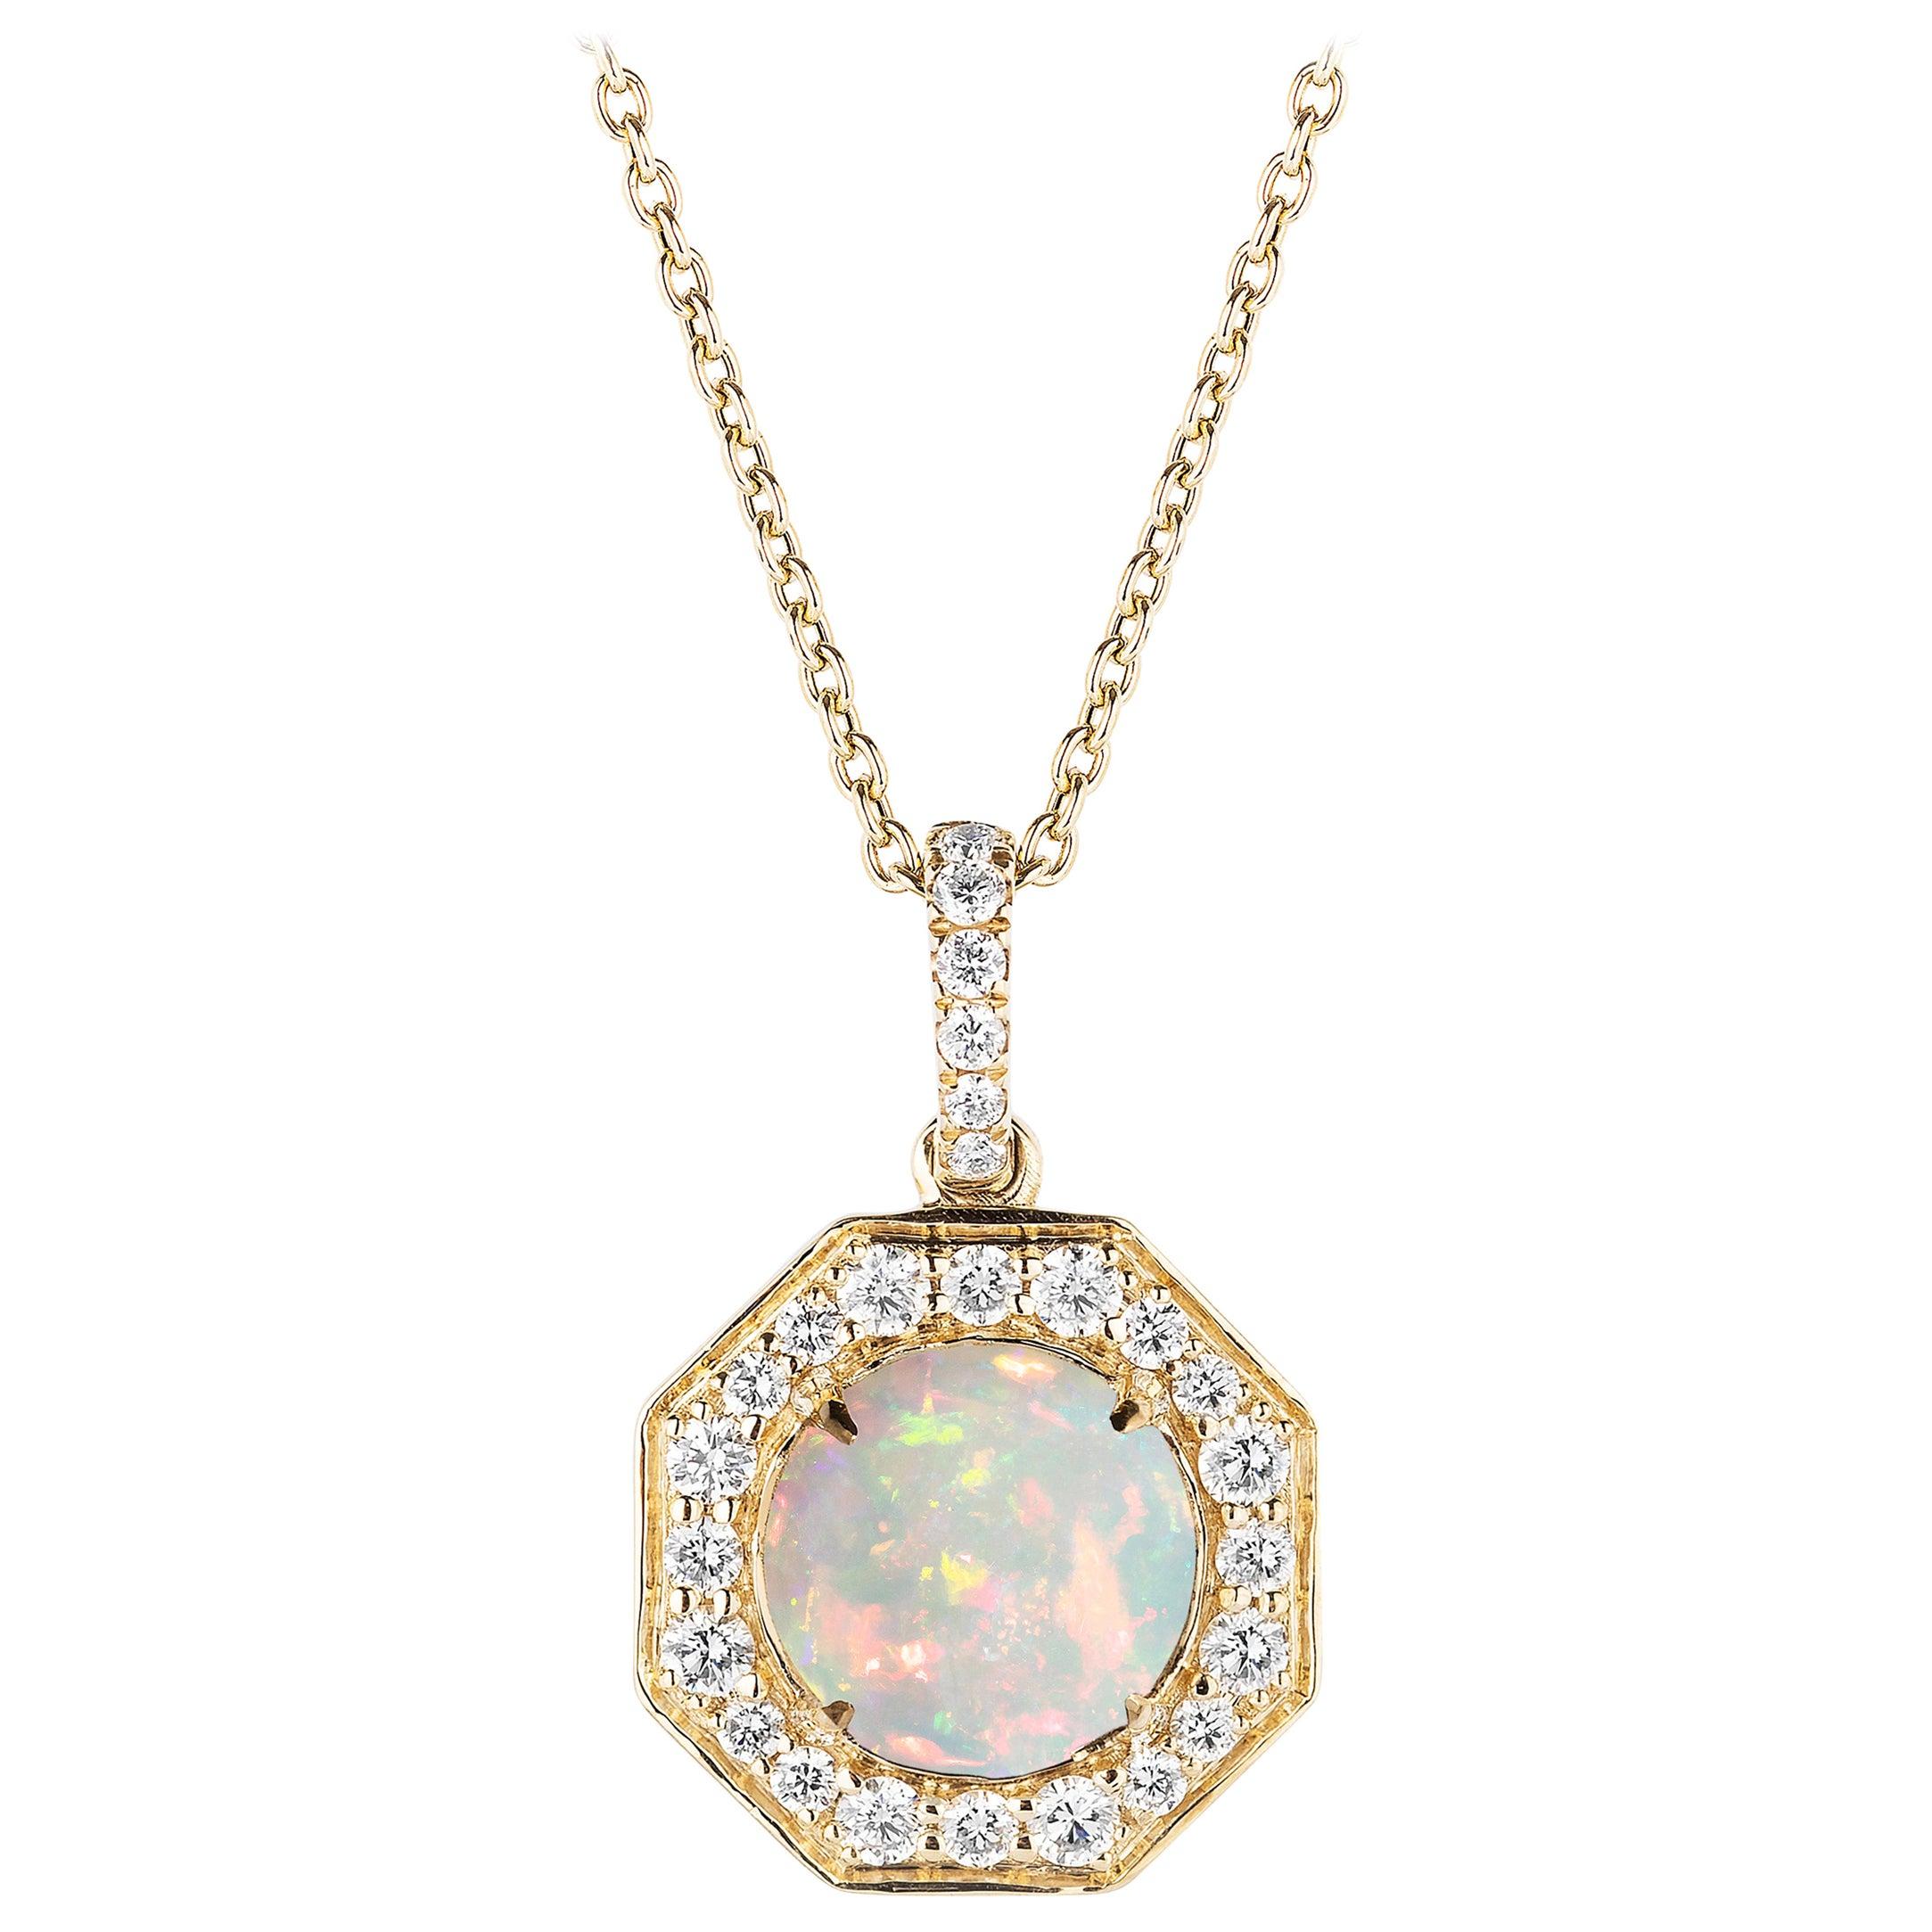 Goshwara Opal Cabochon with Diamond Pendant